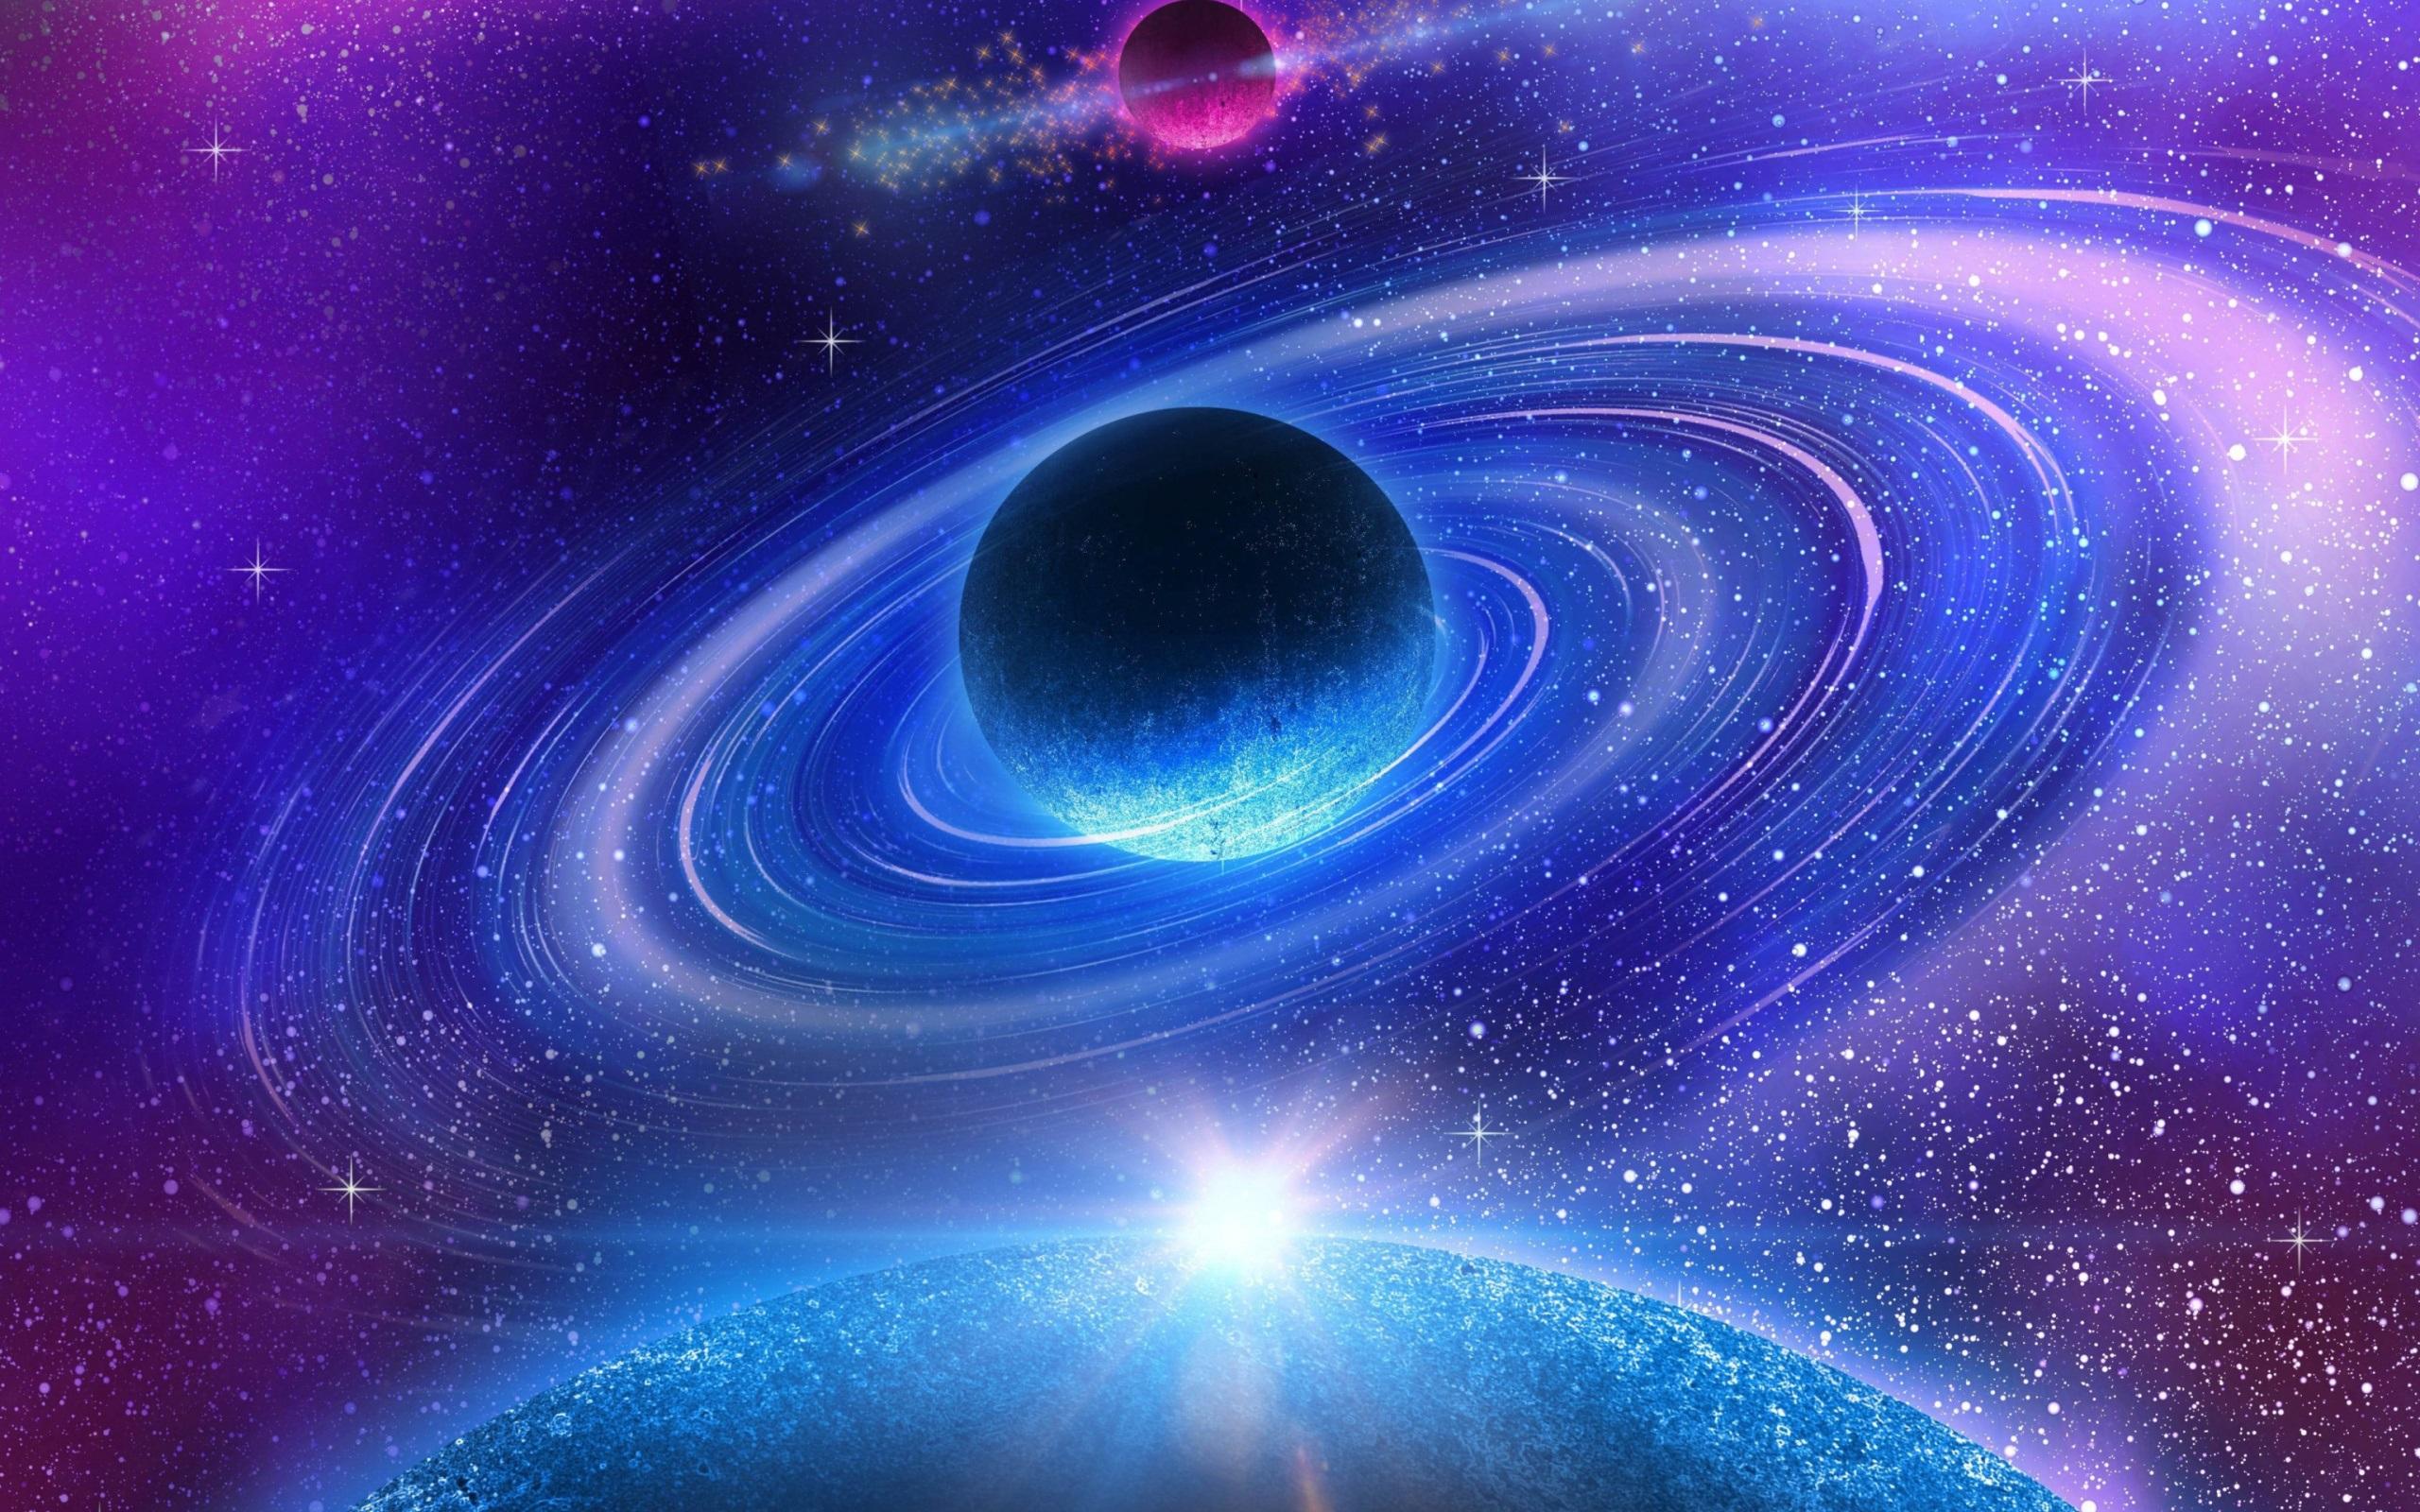 Fondos de pantalla hermoso espacio galaxia nebulosa planeta estrellas 2560x1600 hd imagen - Galaxy nebula live wallpaper ...